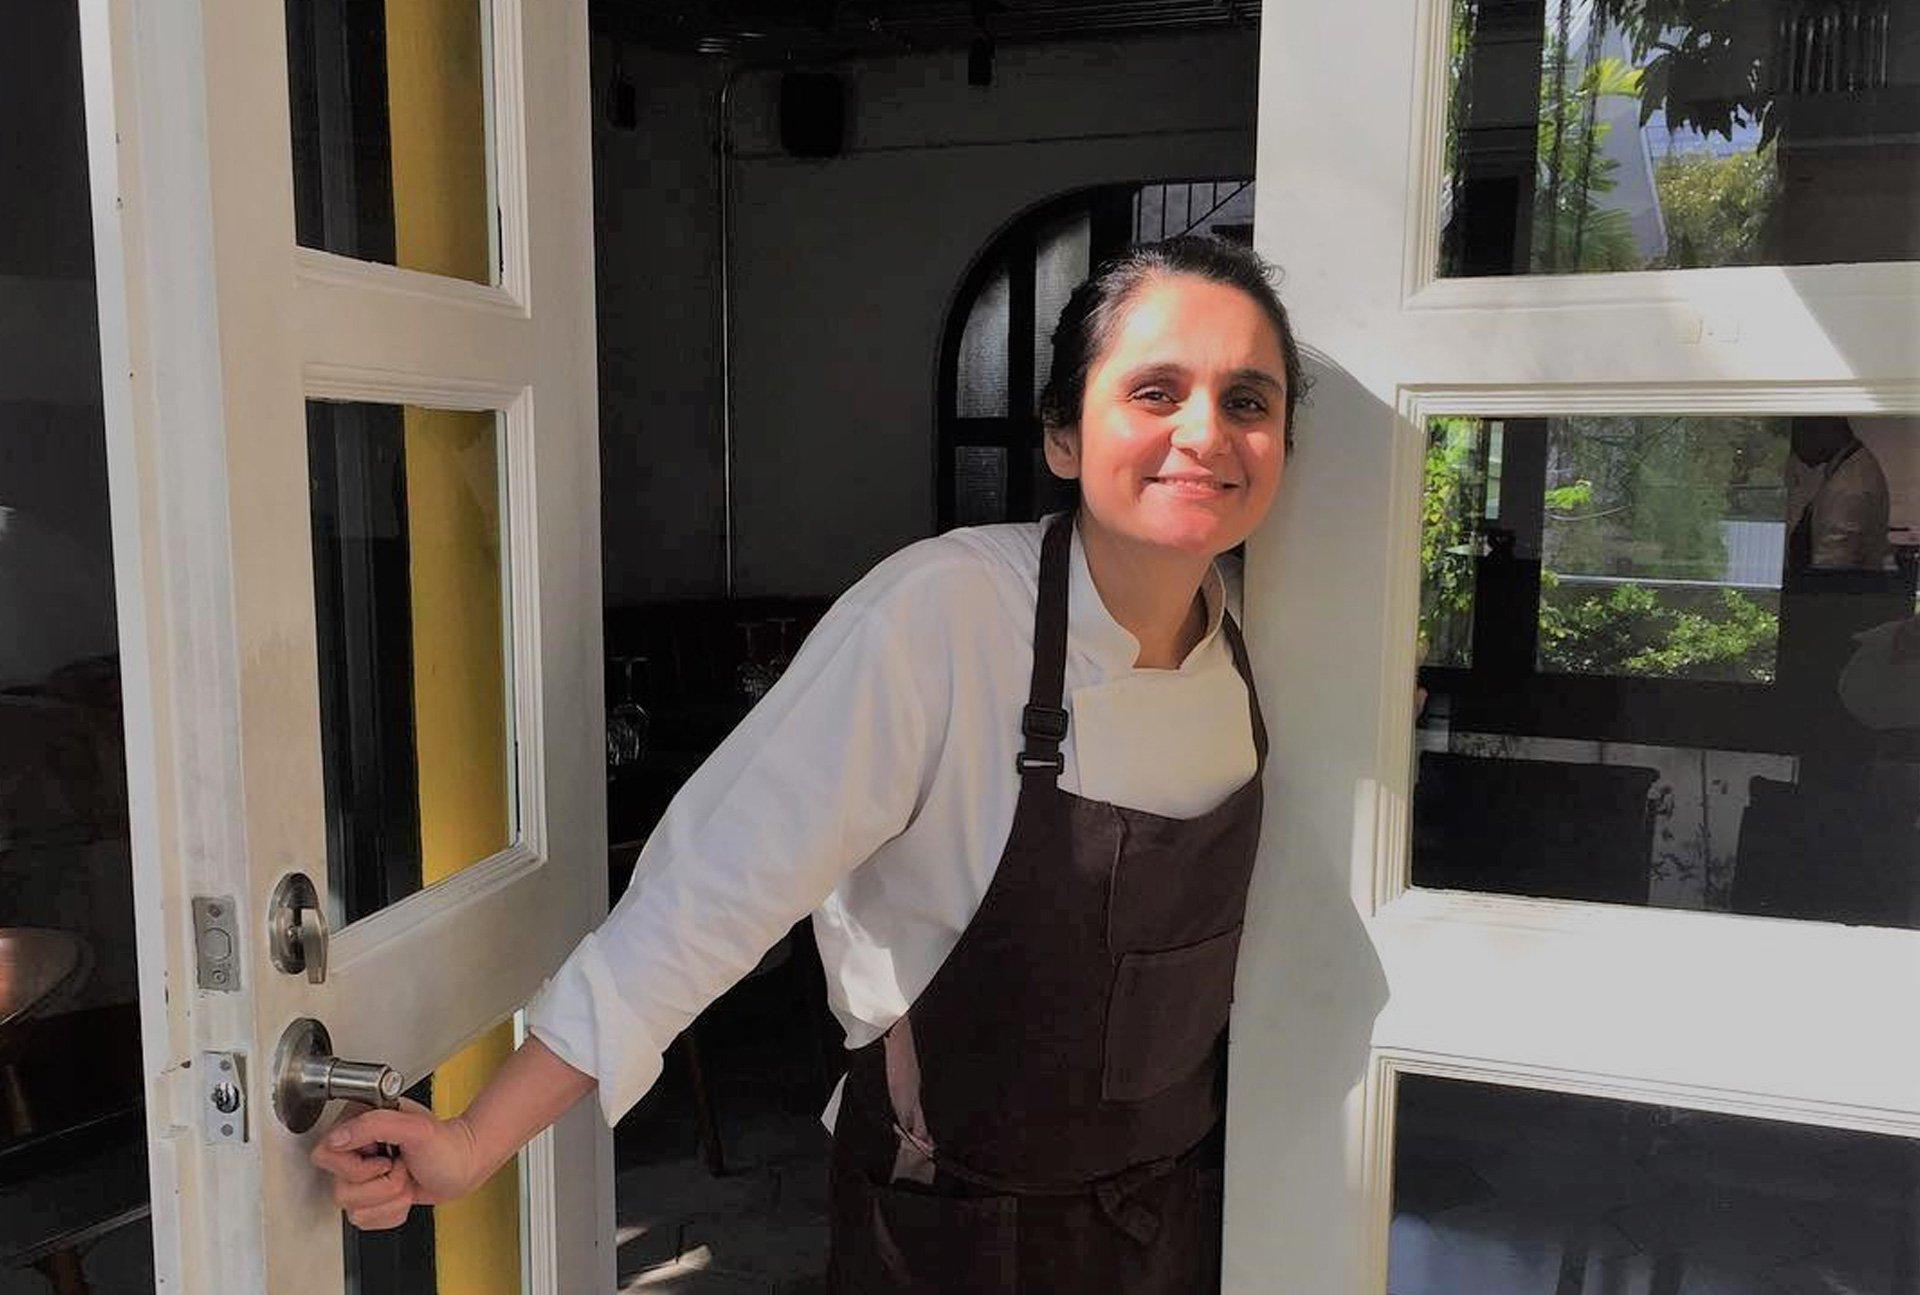 Garima Arora - Alumna Le Cordon Bleu Paris et Meilleure Femme Chef en Asie 2019